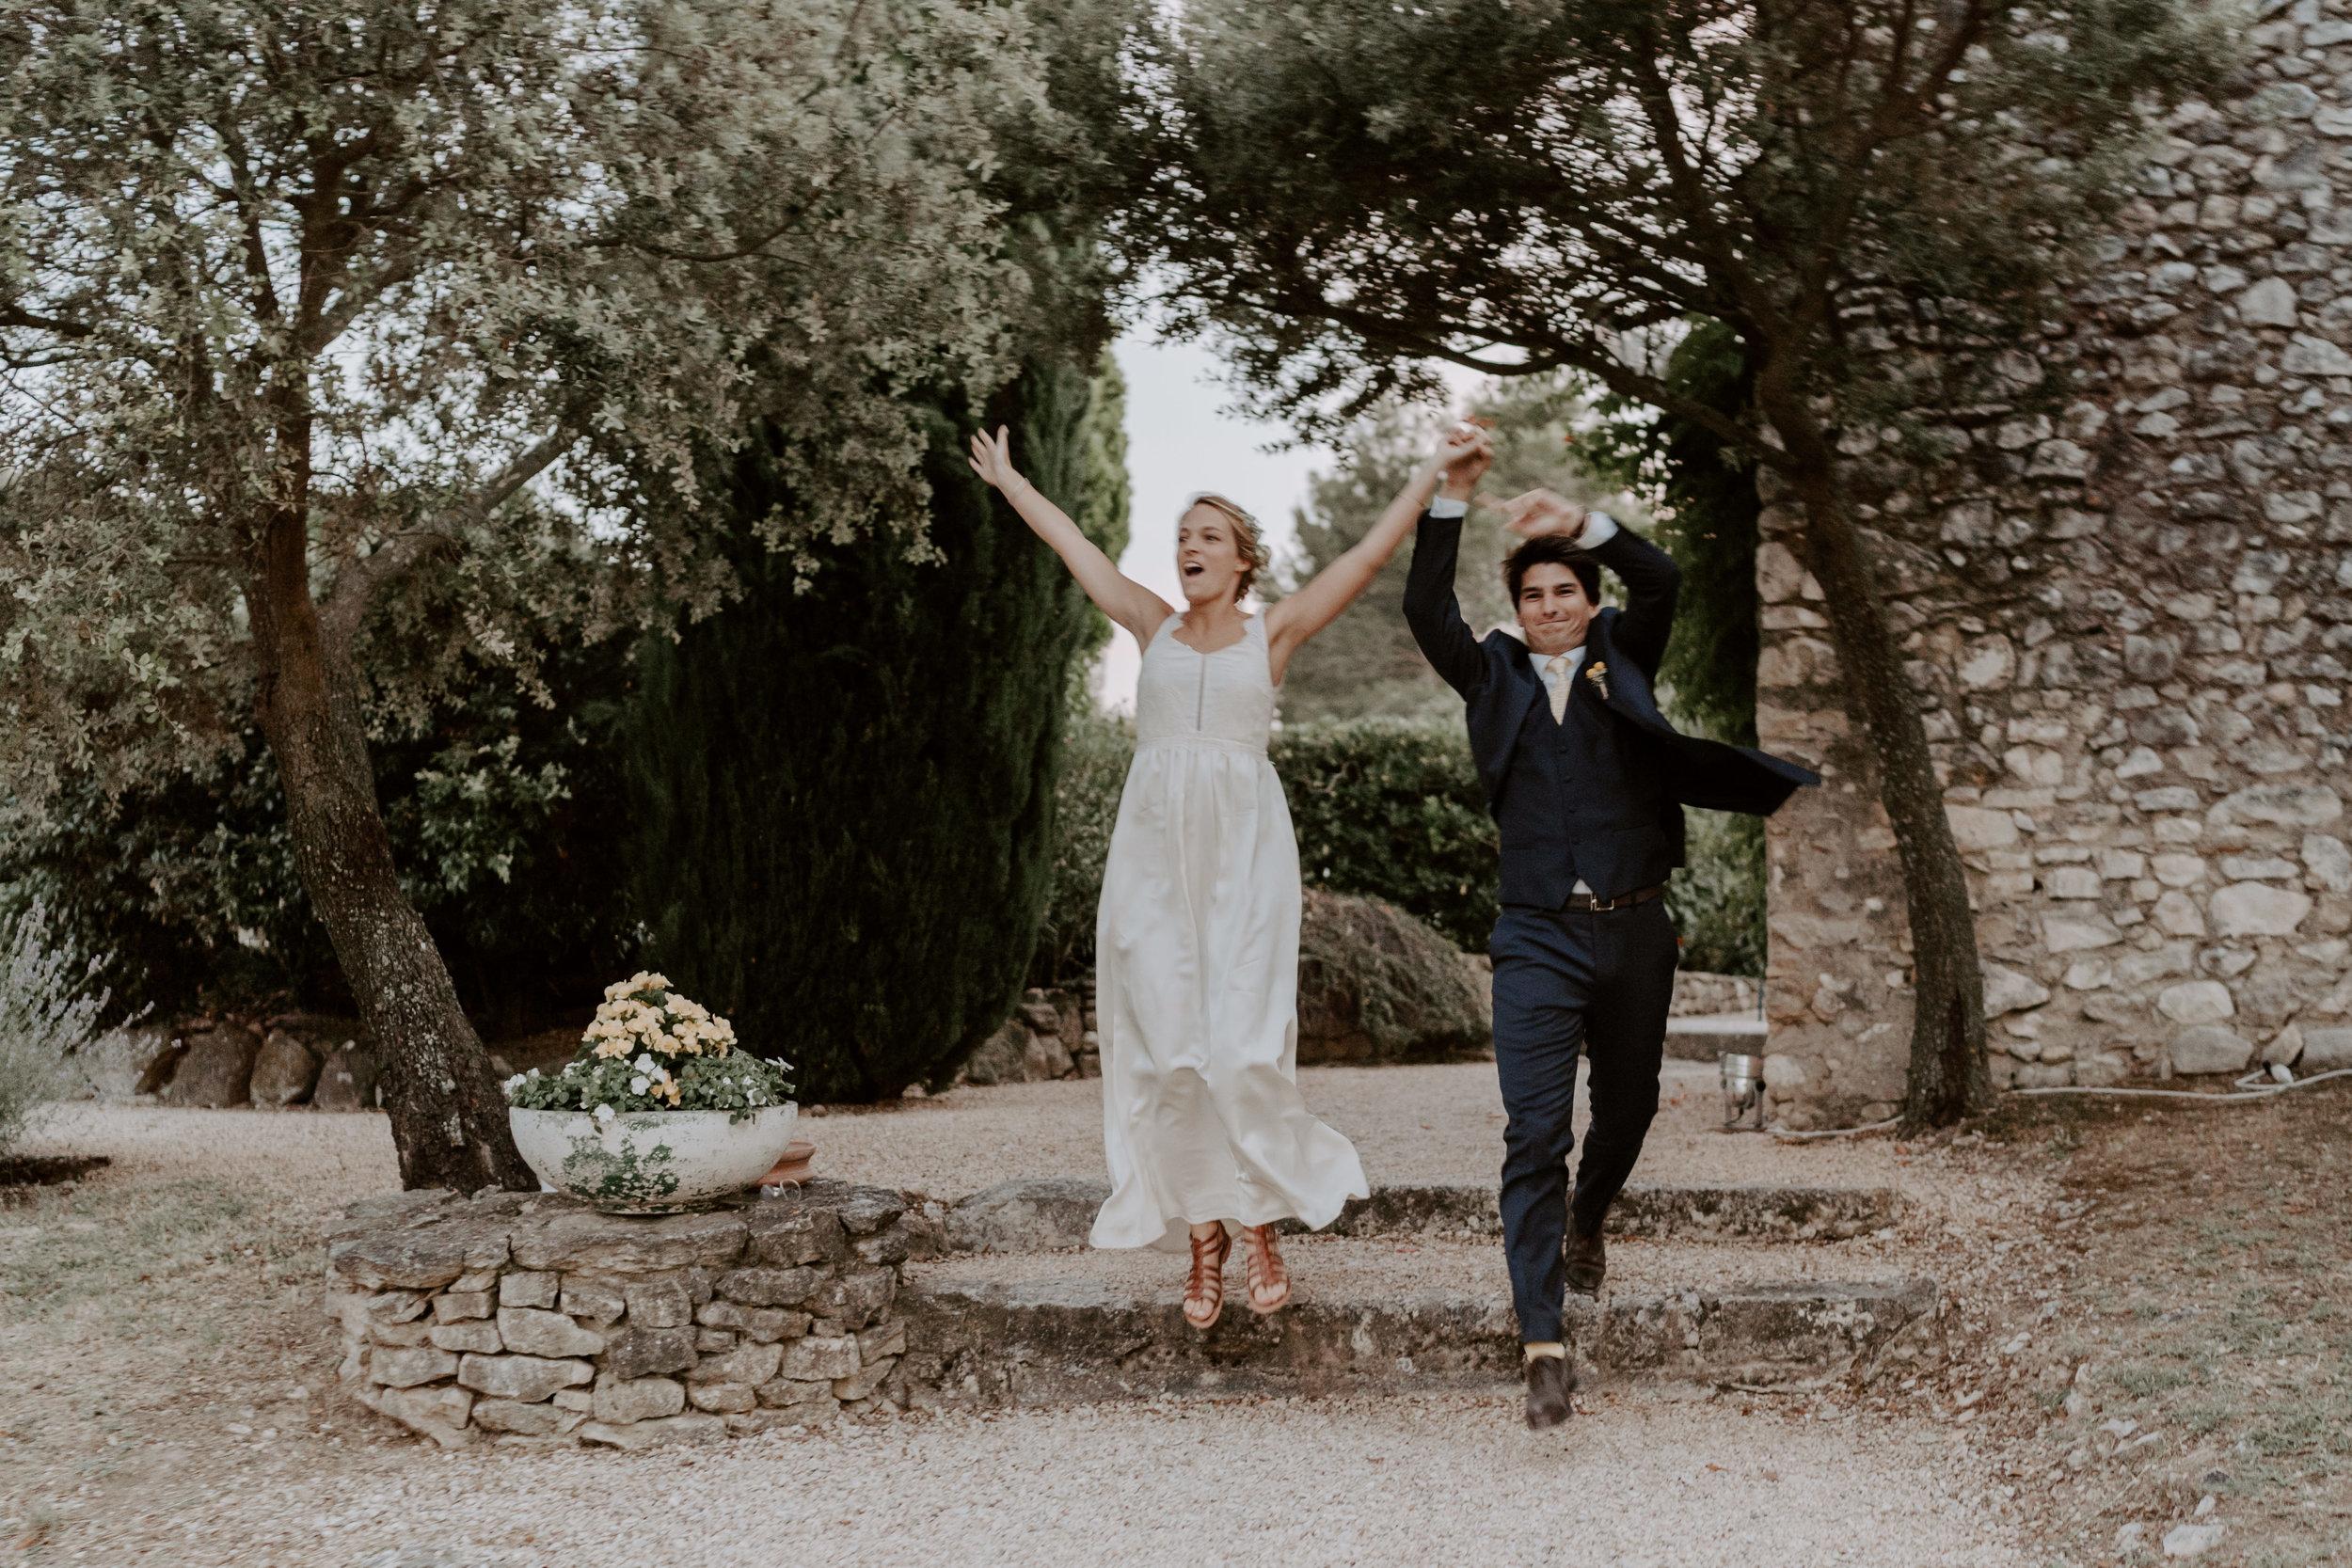 elsacaza_photographe_mariage_Juliette_Nicolas-728.jpg